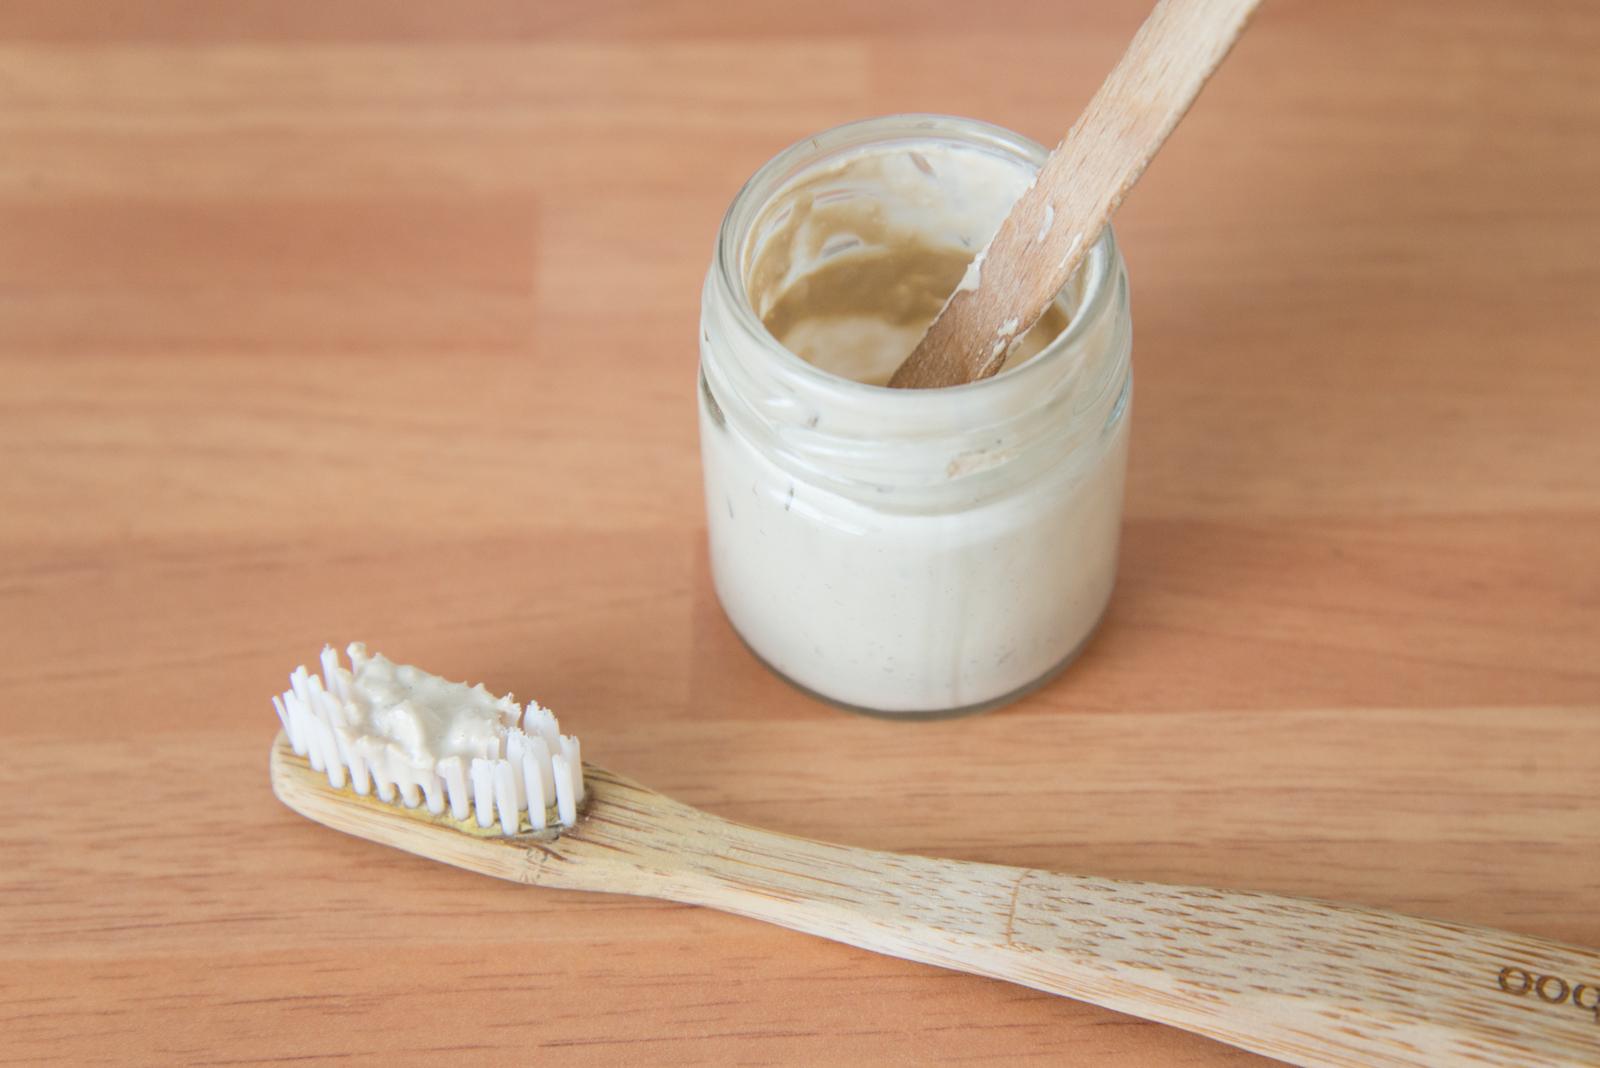 Dentifrice à base de carbonate de calcium